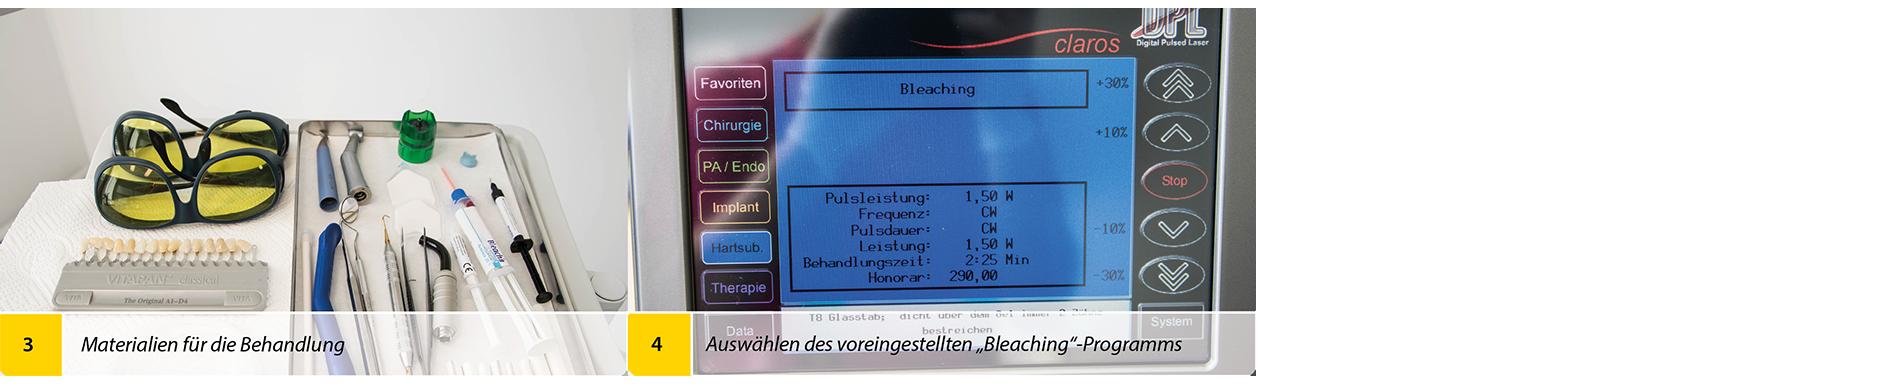 2020-04_Bleaching_Anwenderbericht_Heck_Bilder2